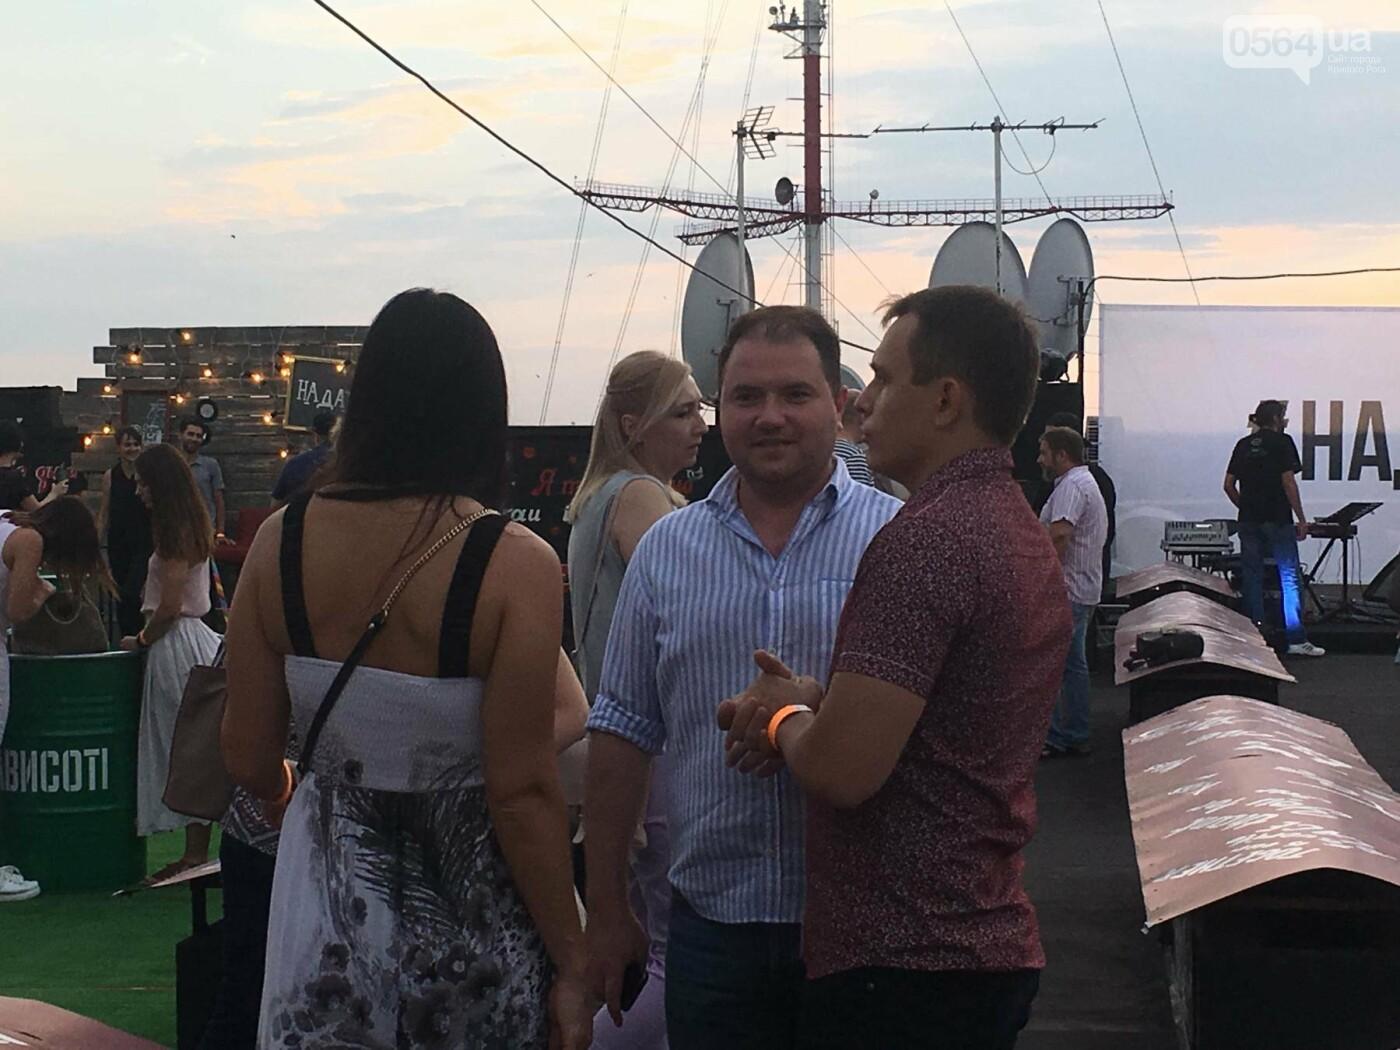 Сотни криворожан встречали закат на крыше отеля под мелодии джаза, - ФОТО, ВИДЕО, фото-20